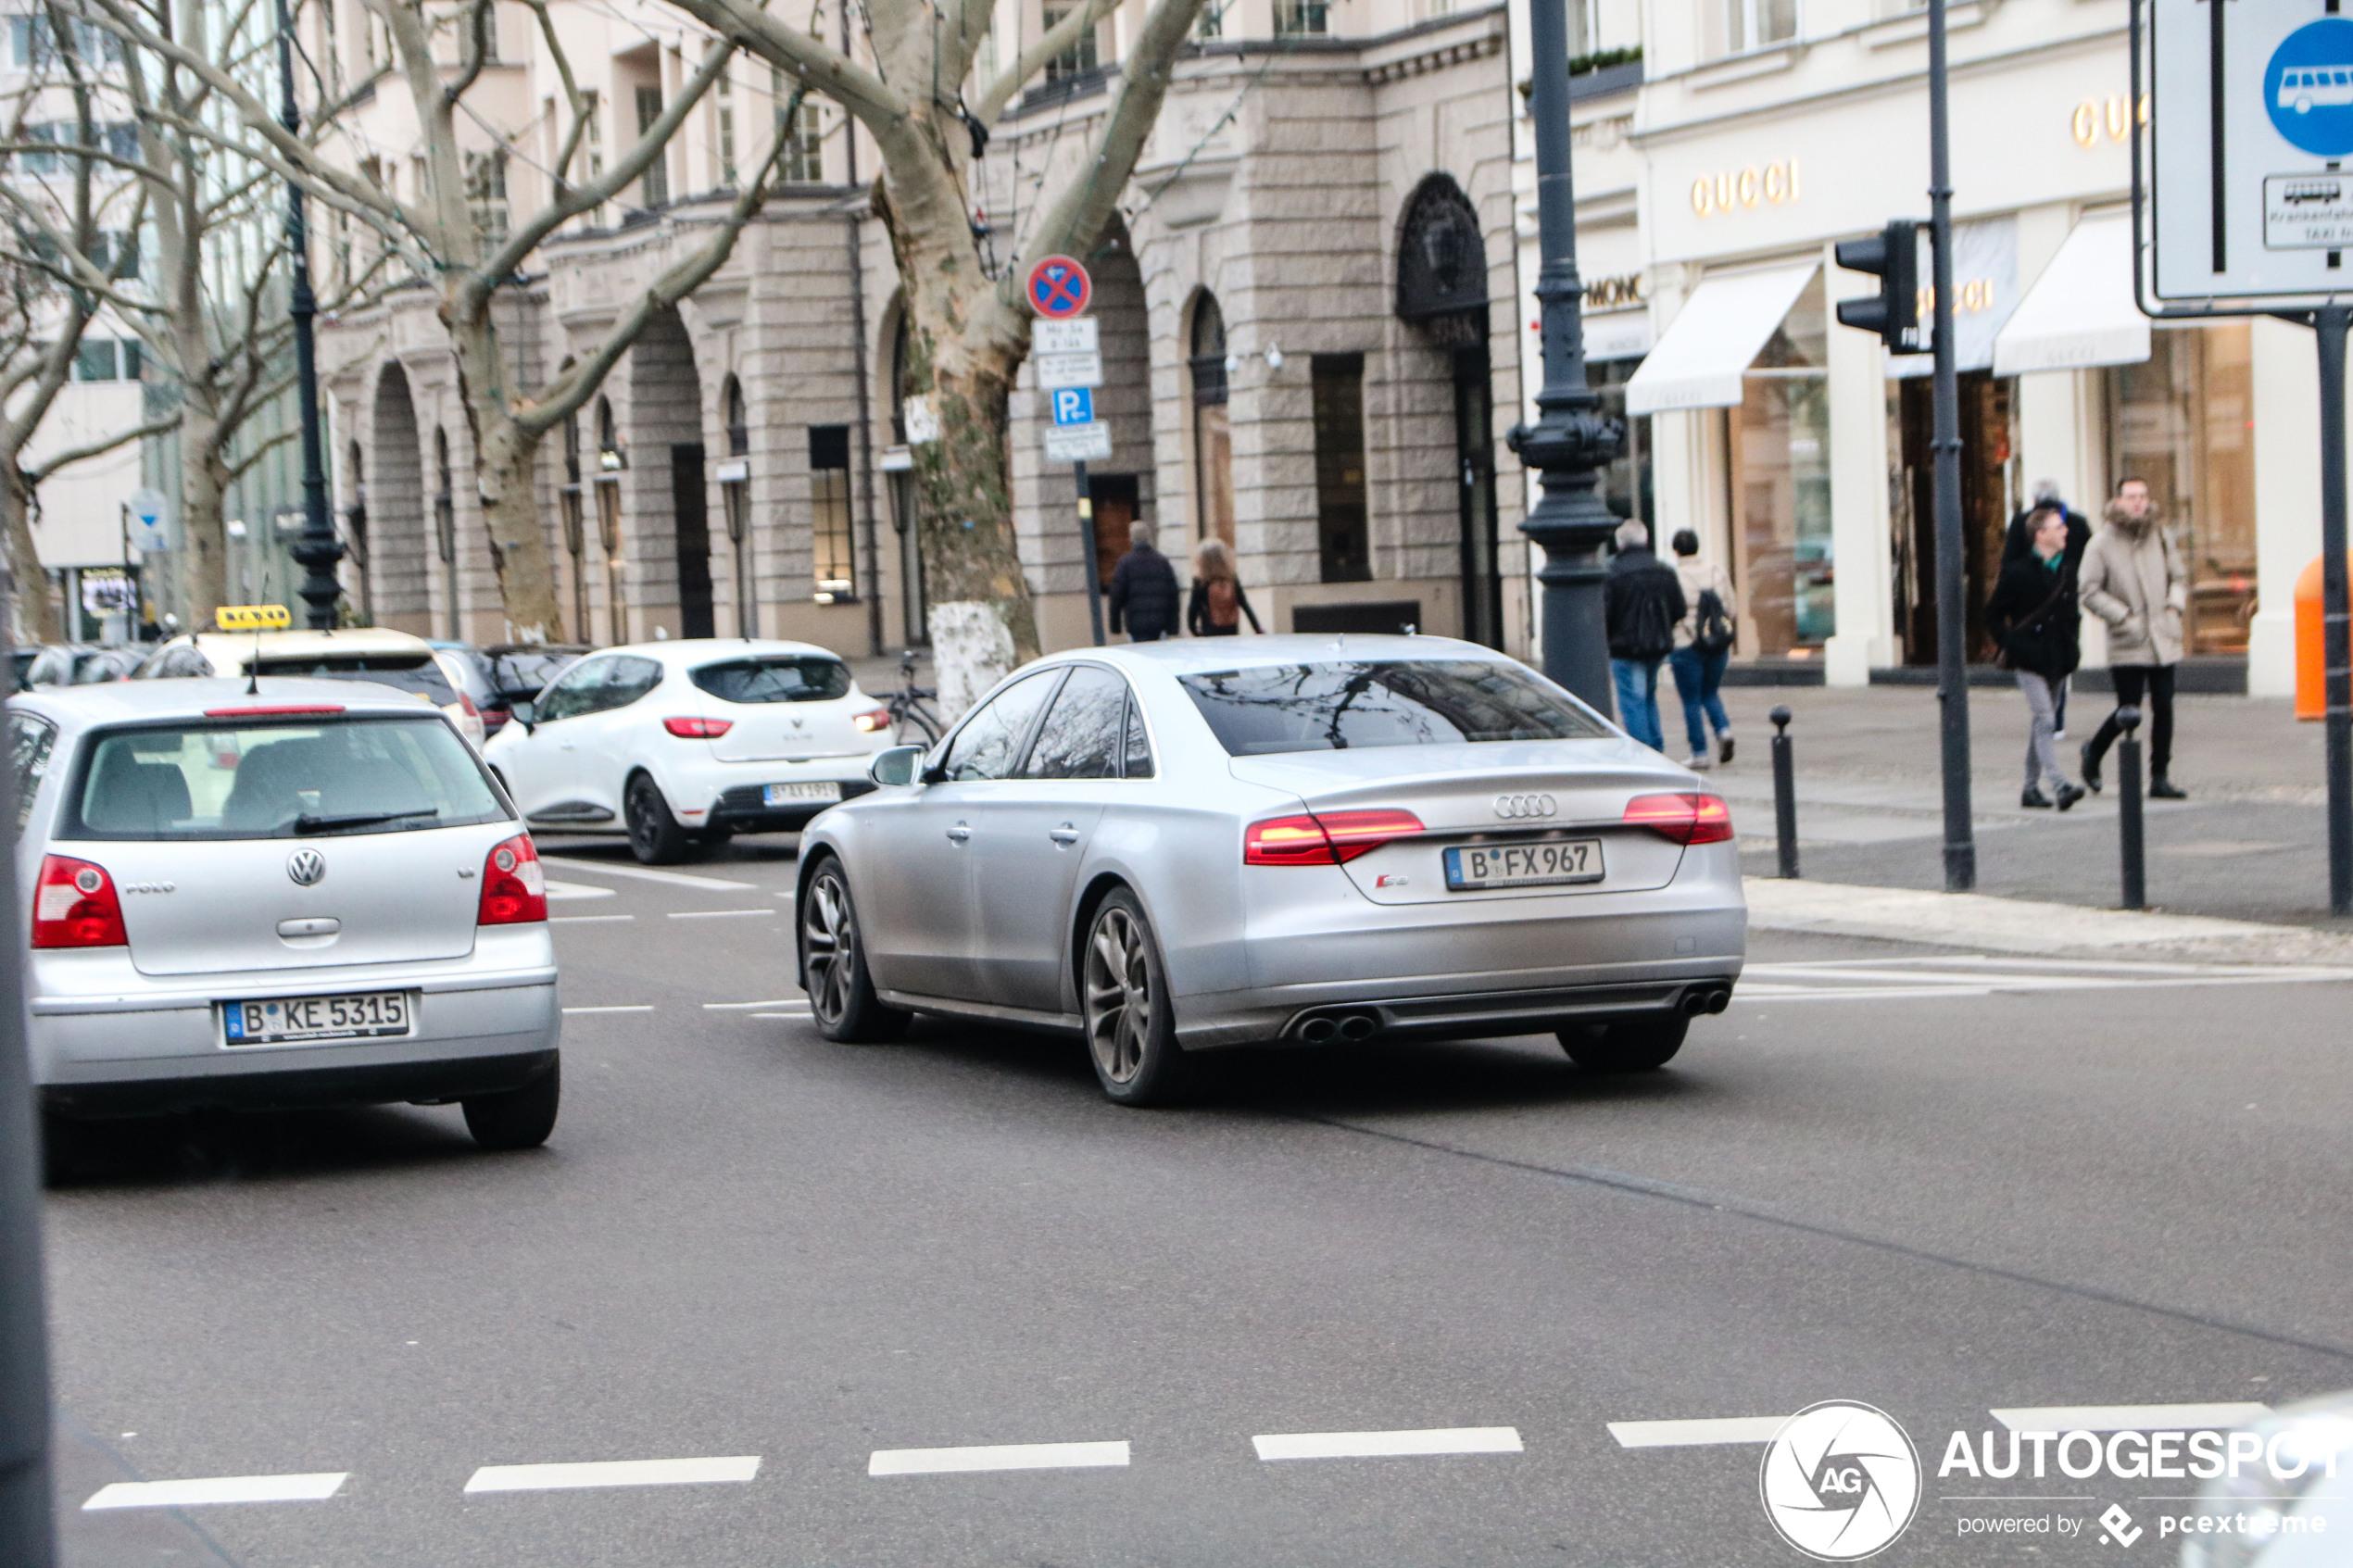 Audi S8 D4 2014 - 22 december 2019 - Autogespot